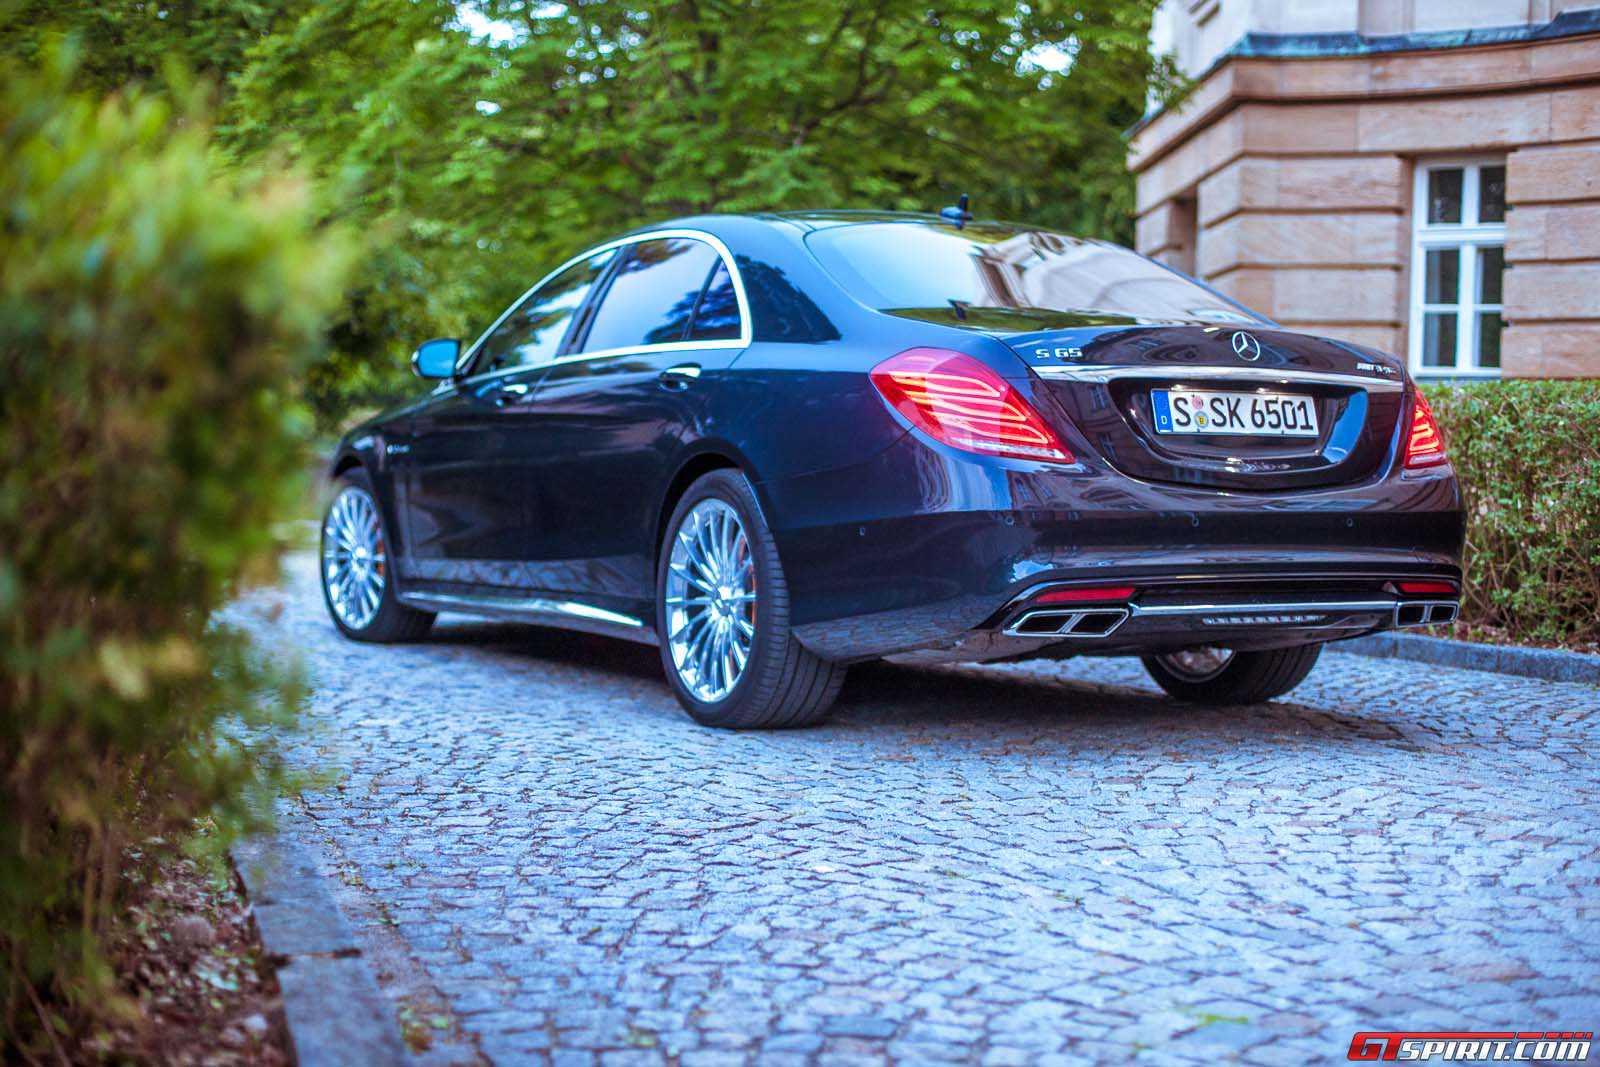 2015 mercedes benz s65 amg review gtspirit for Mercedes benz amg s65